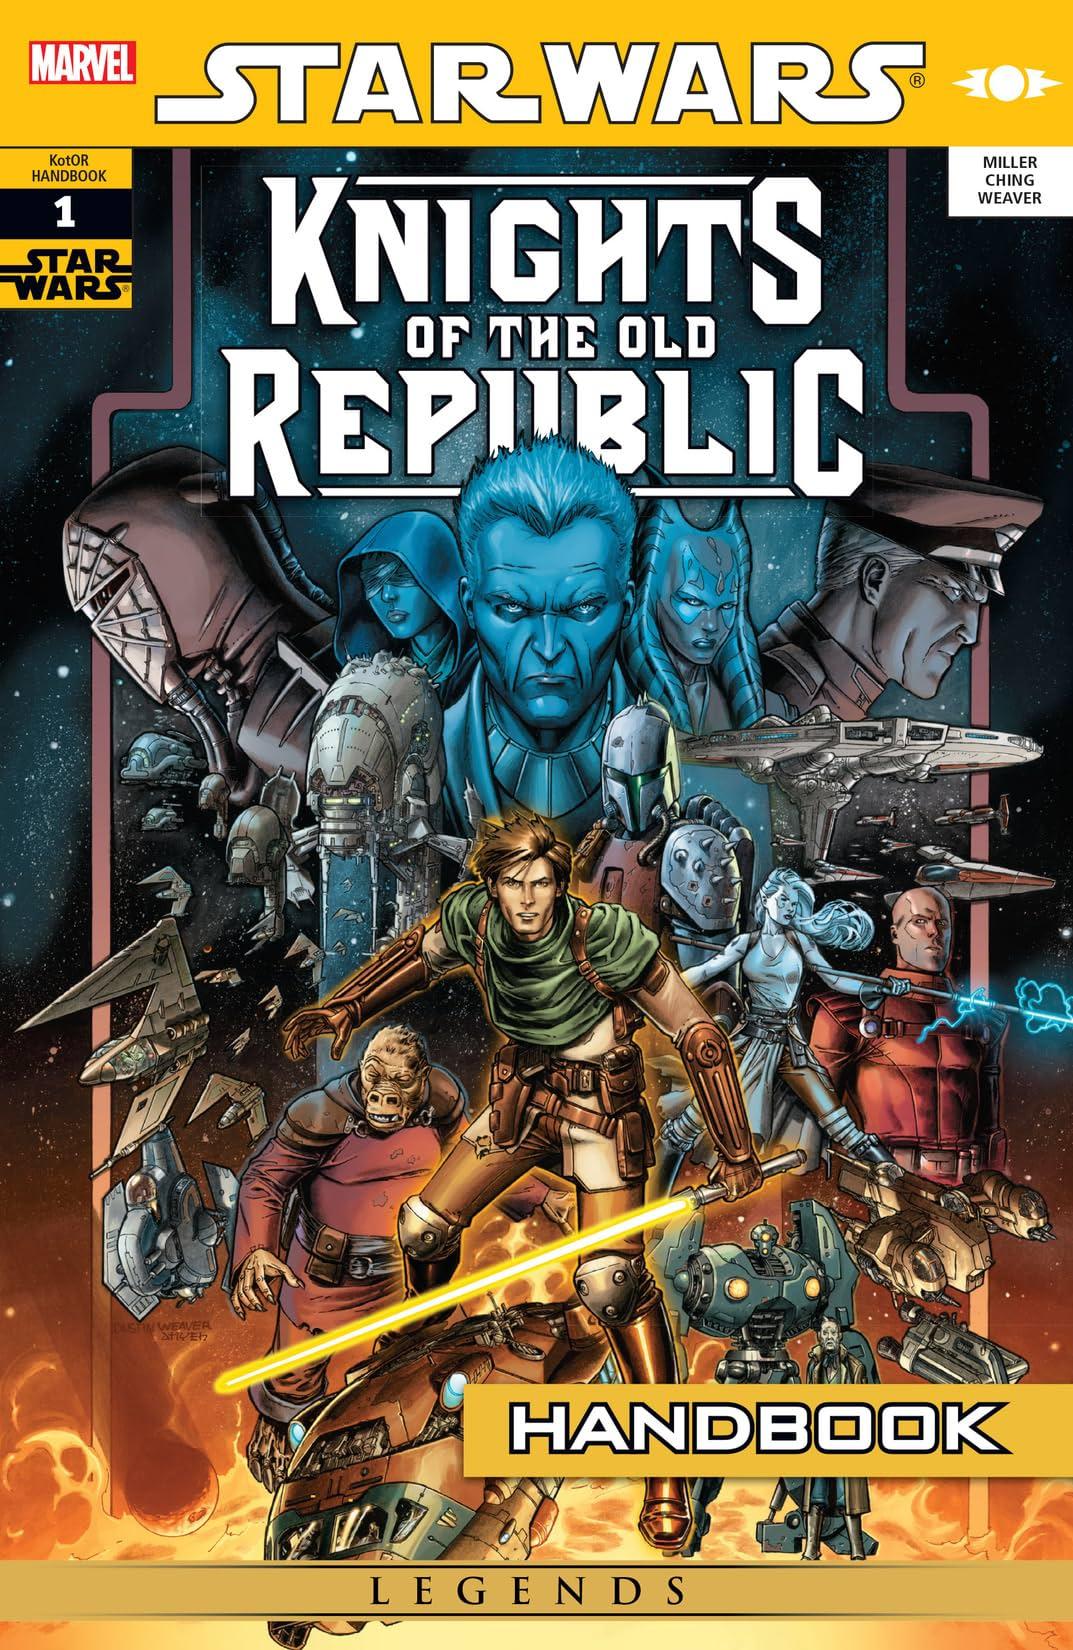 Star Wars: Knights of the Old Republic Handbook (2007) #1